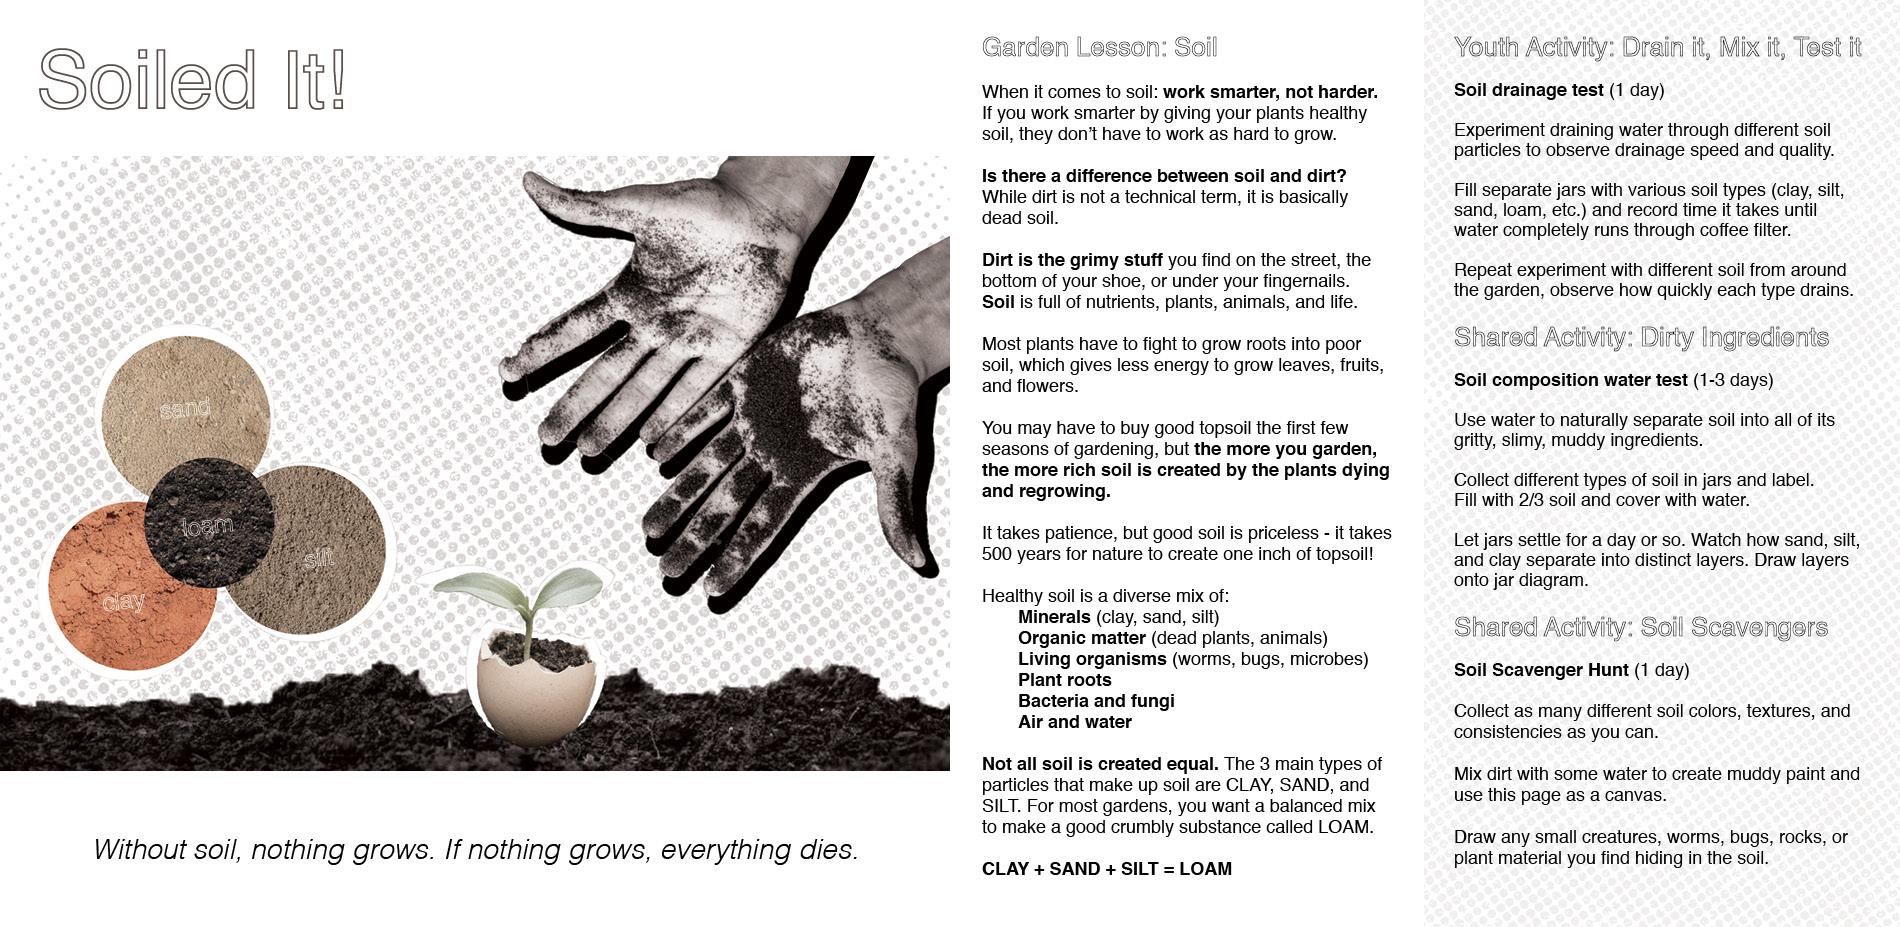 Soiled It!: Building Healthy Soil